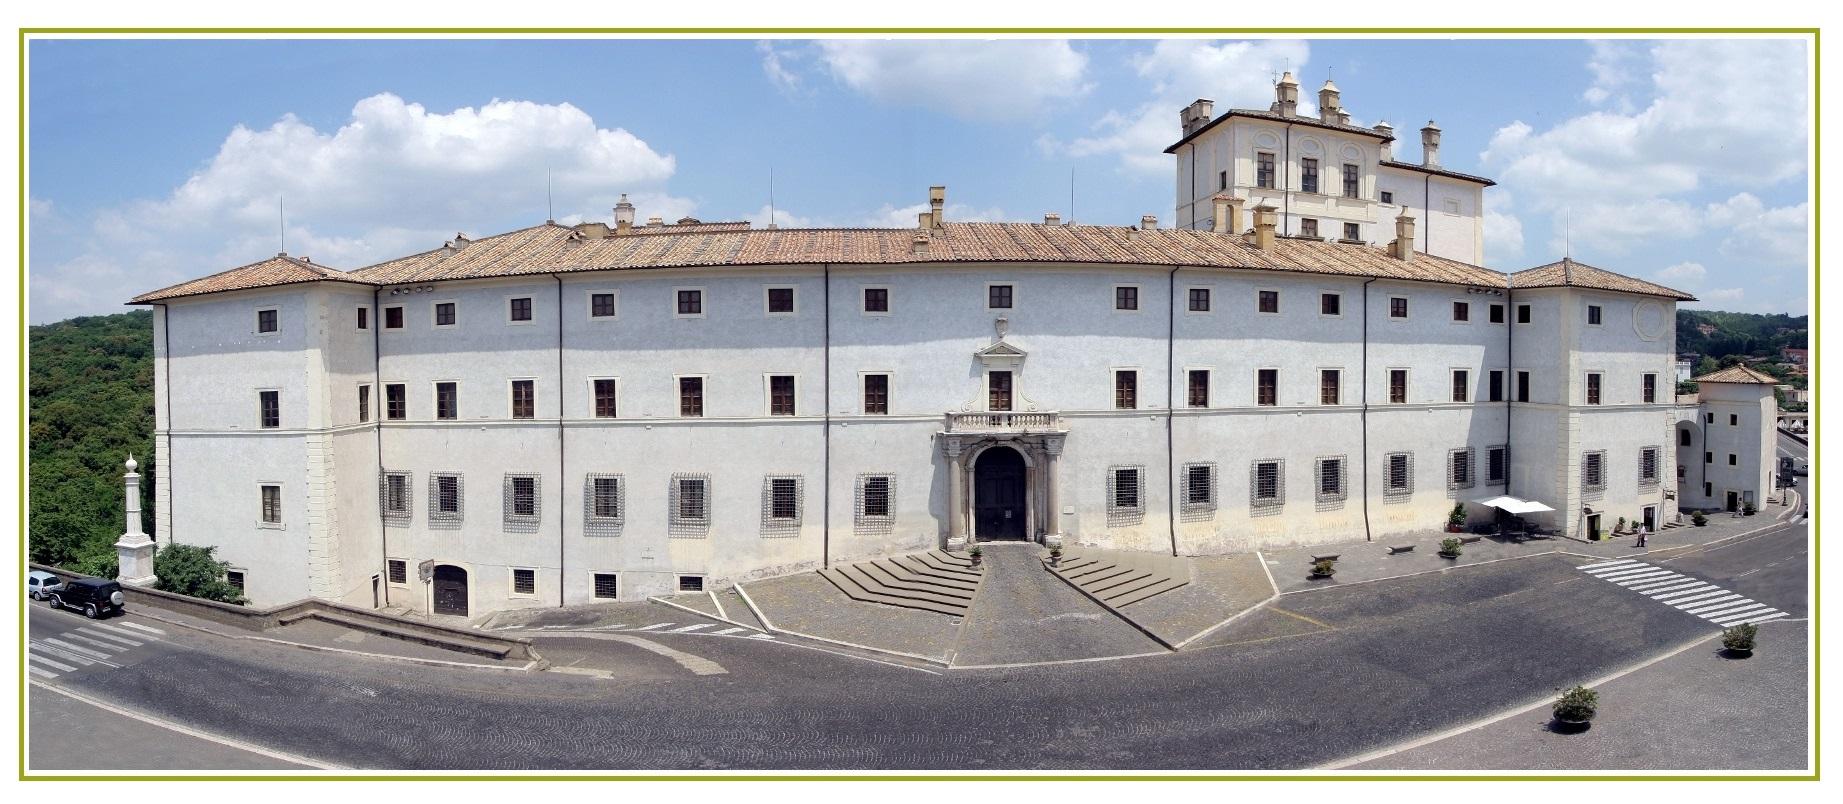 Ariccia-Palazzo-Chigi